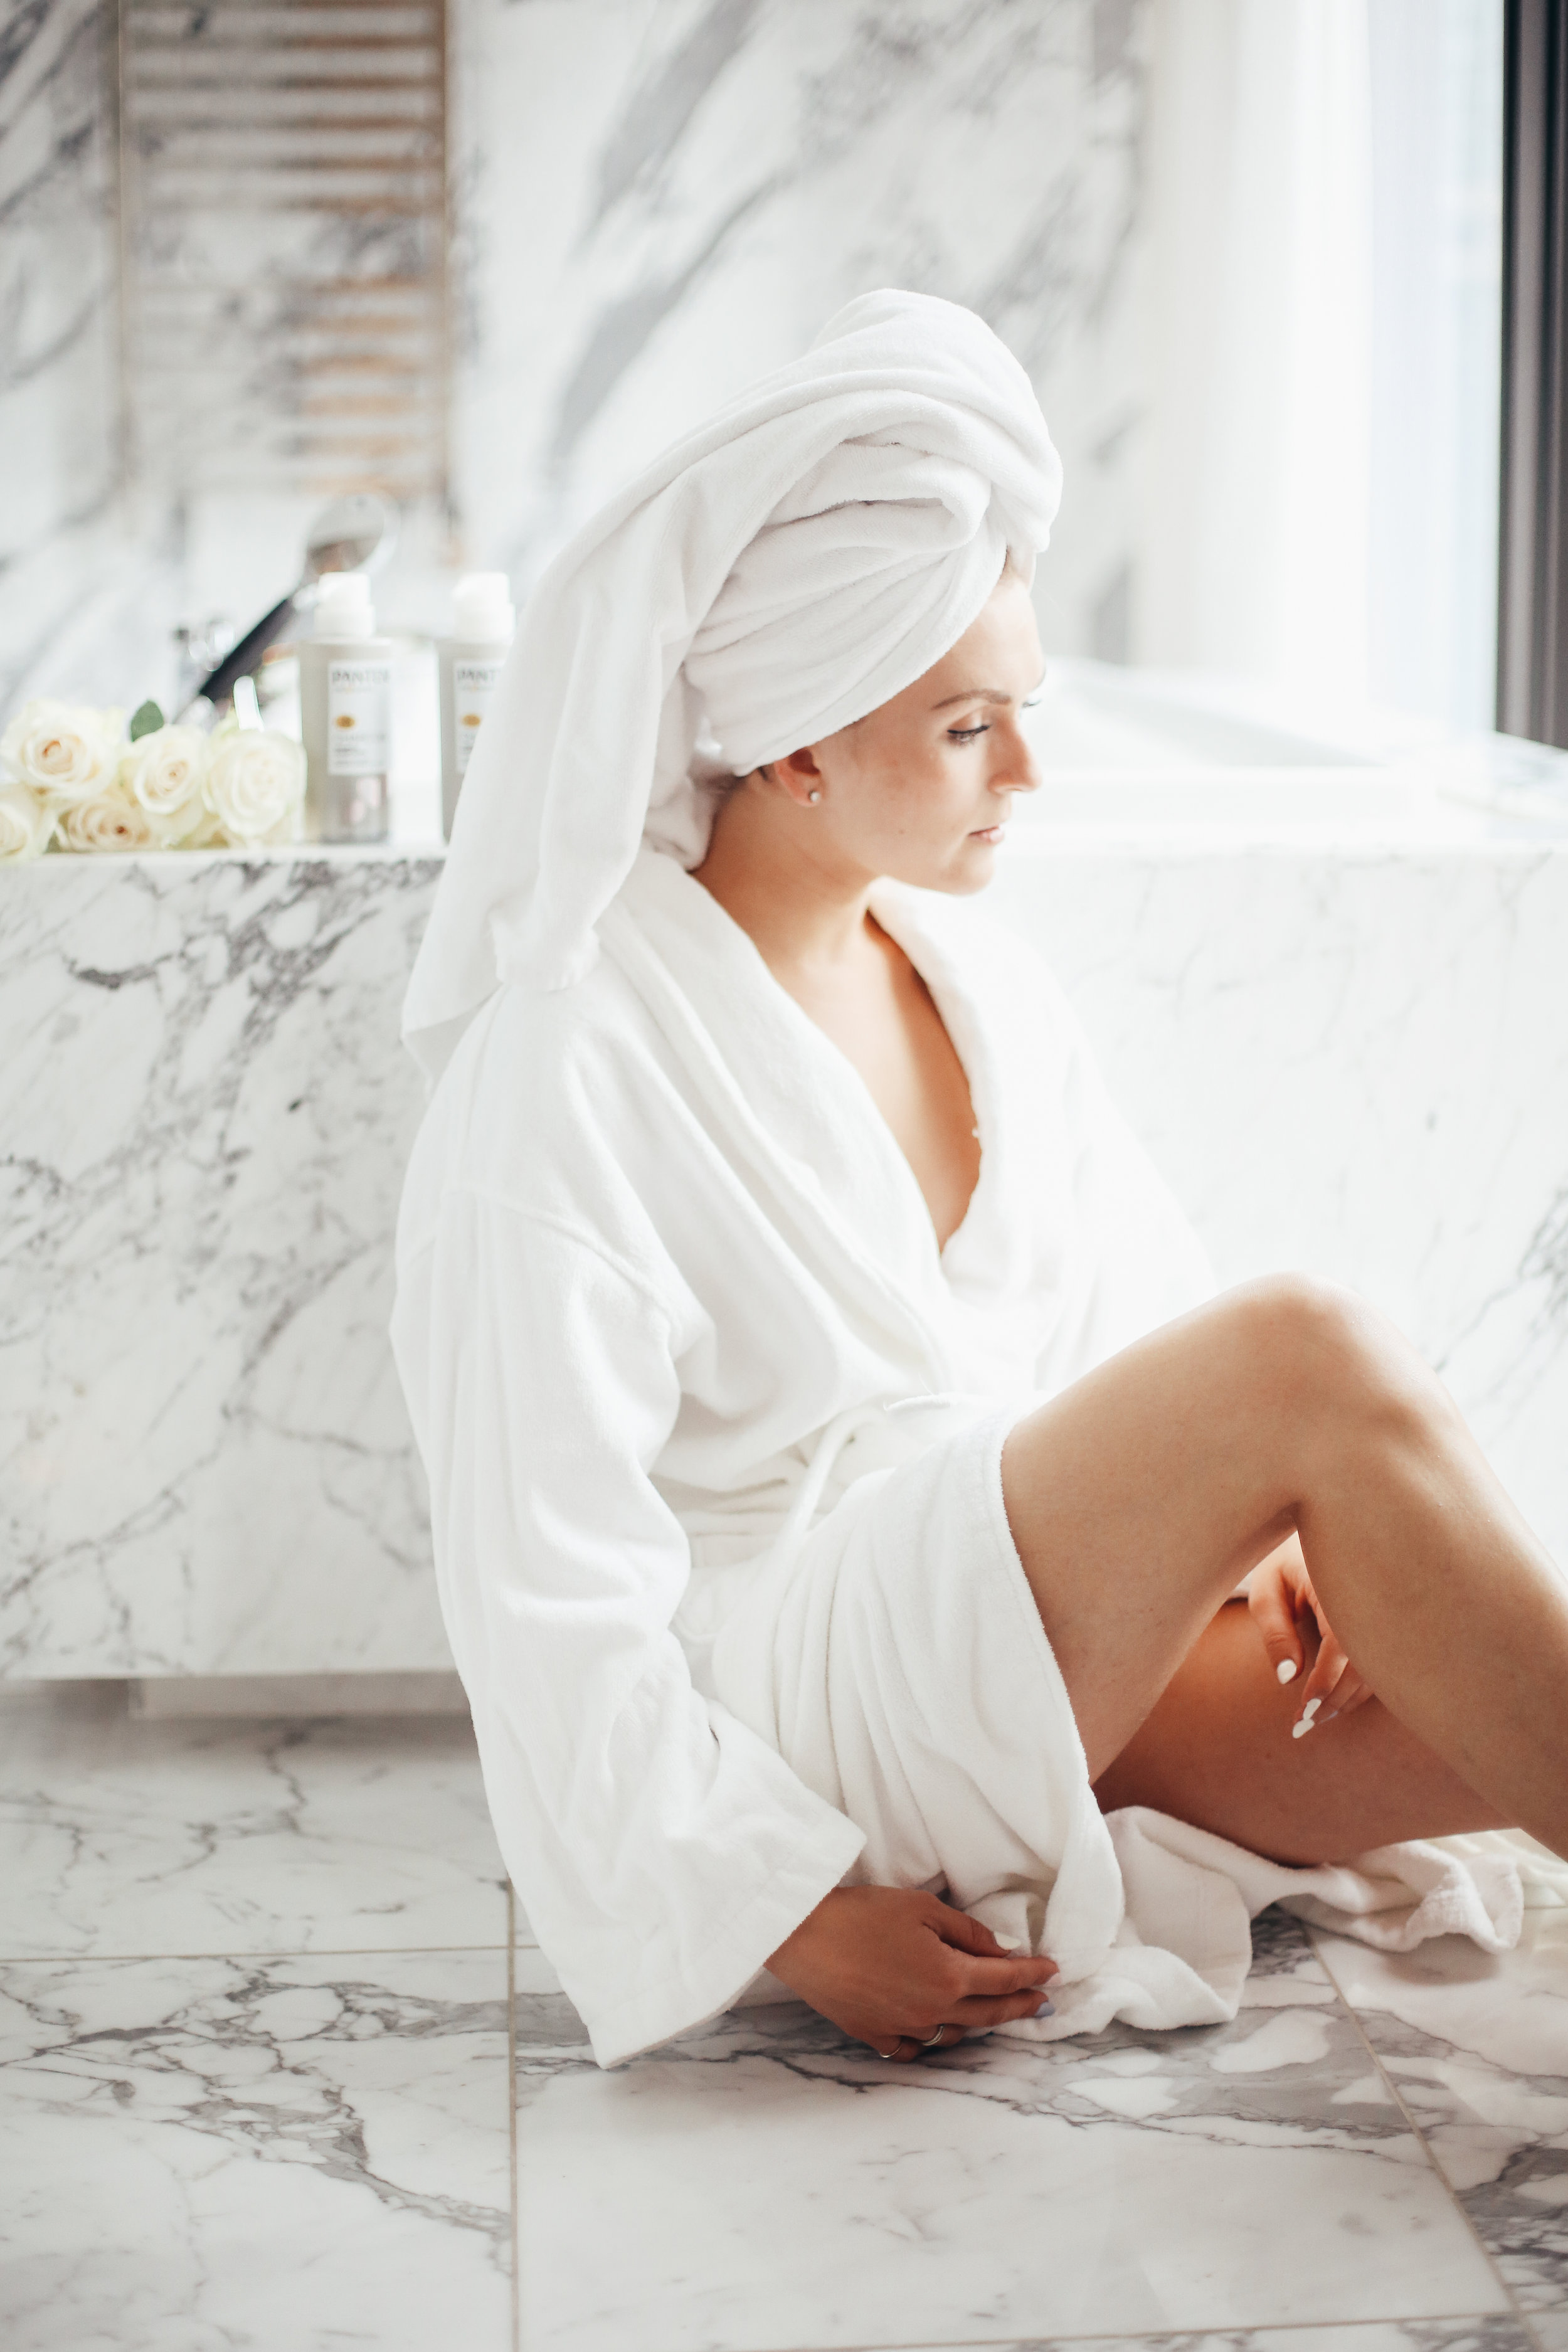 pantene charcoal shampoo conditioner